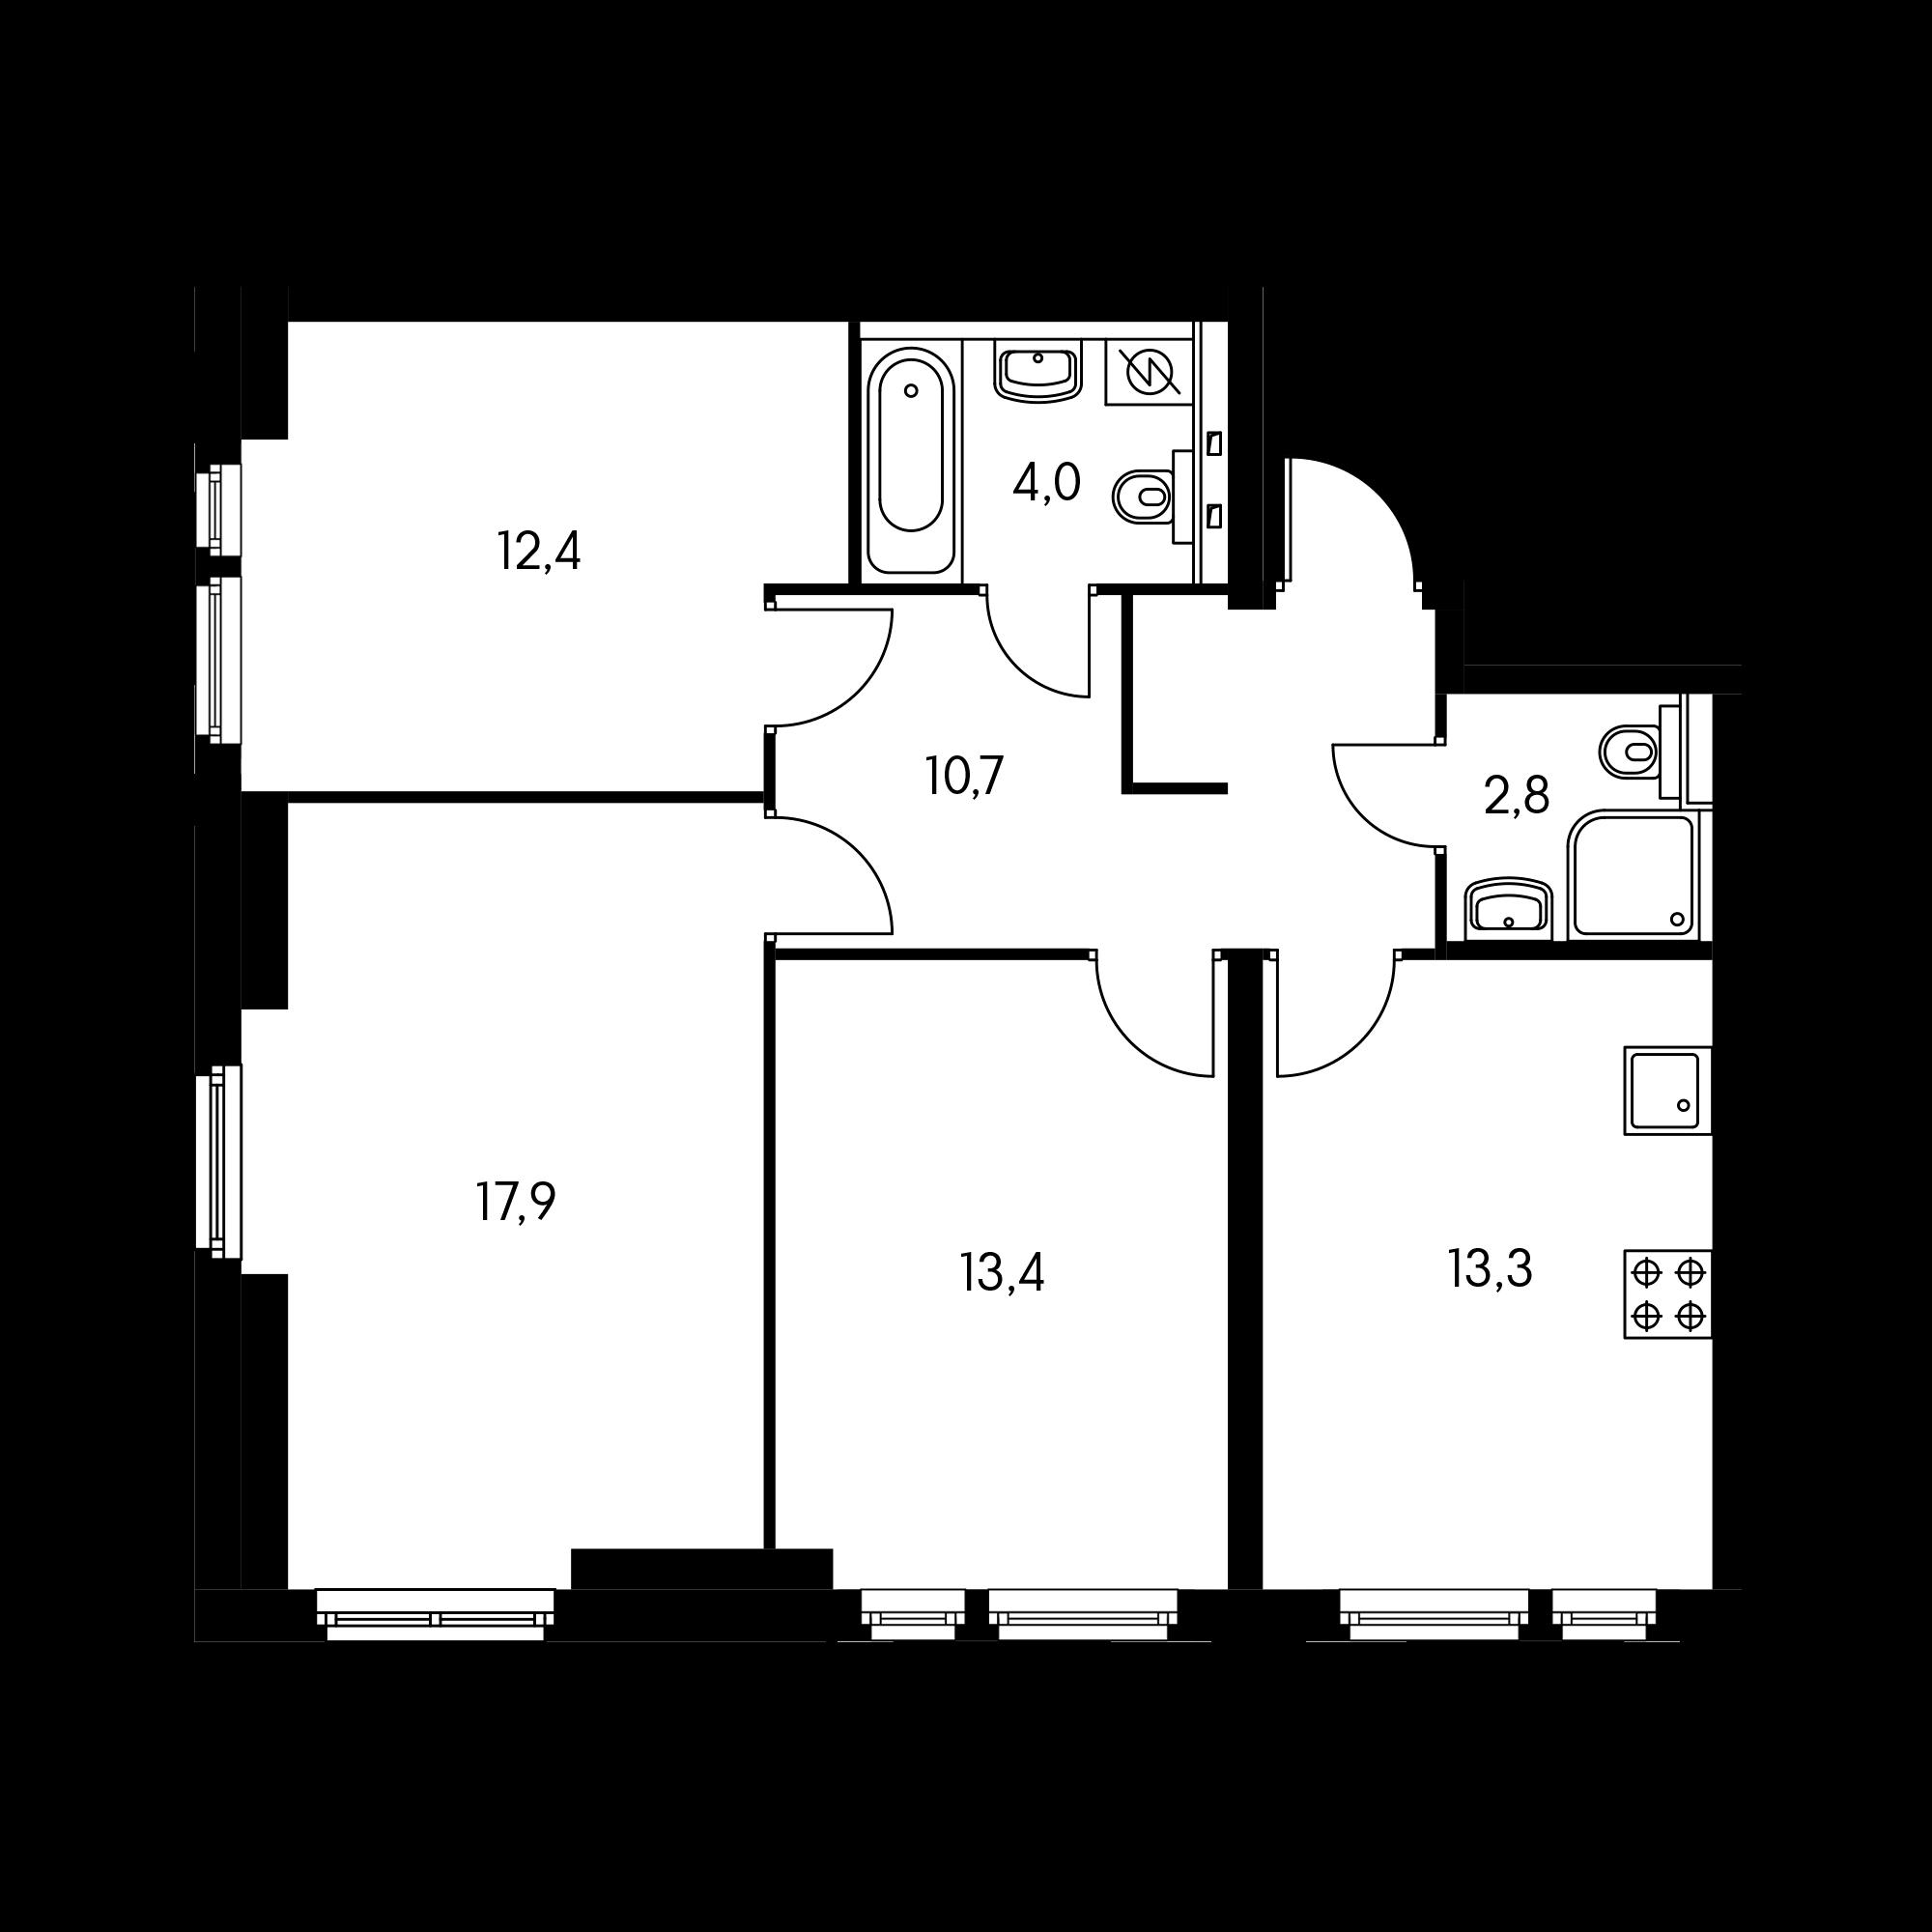 3KM1_10.2-2